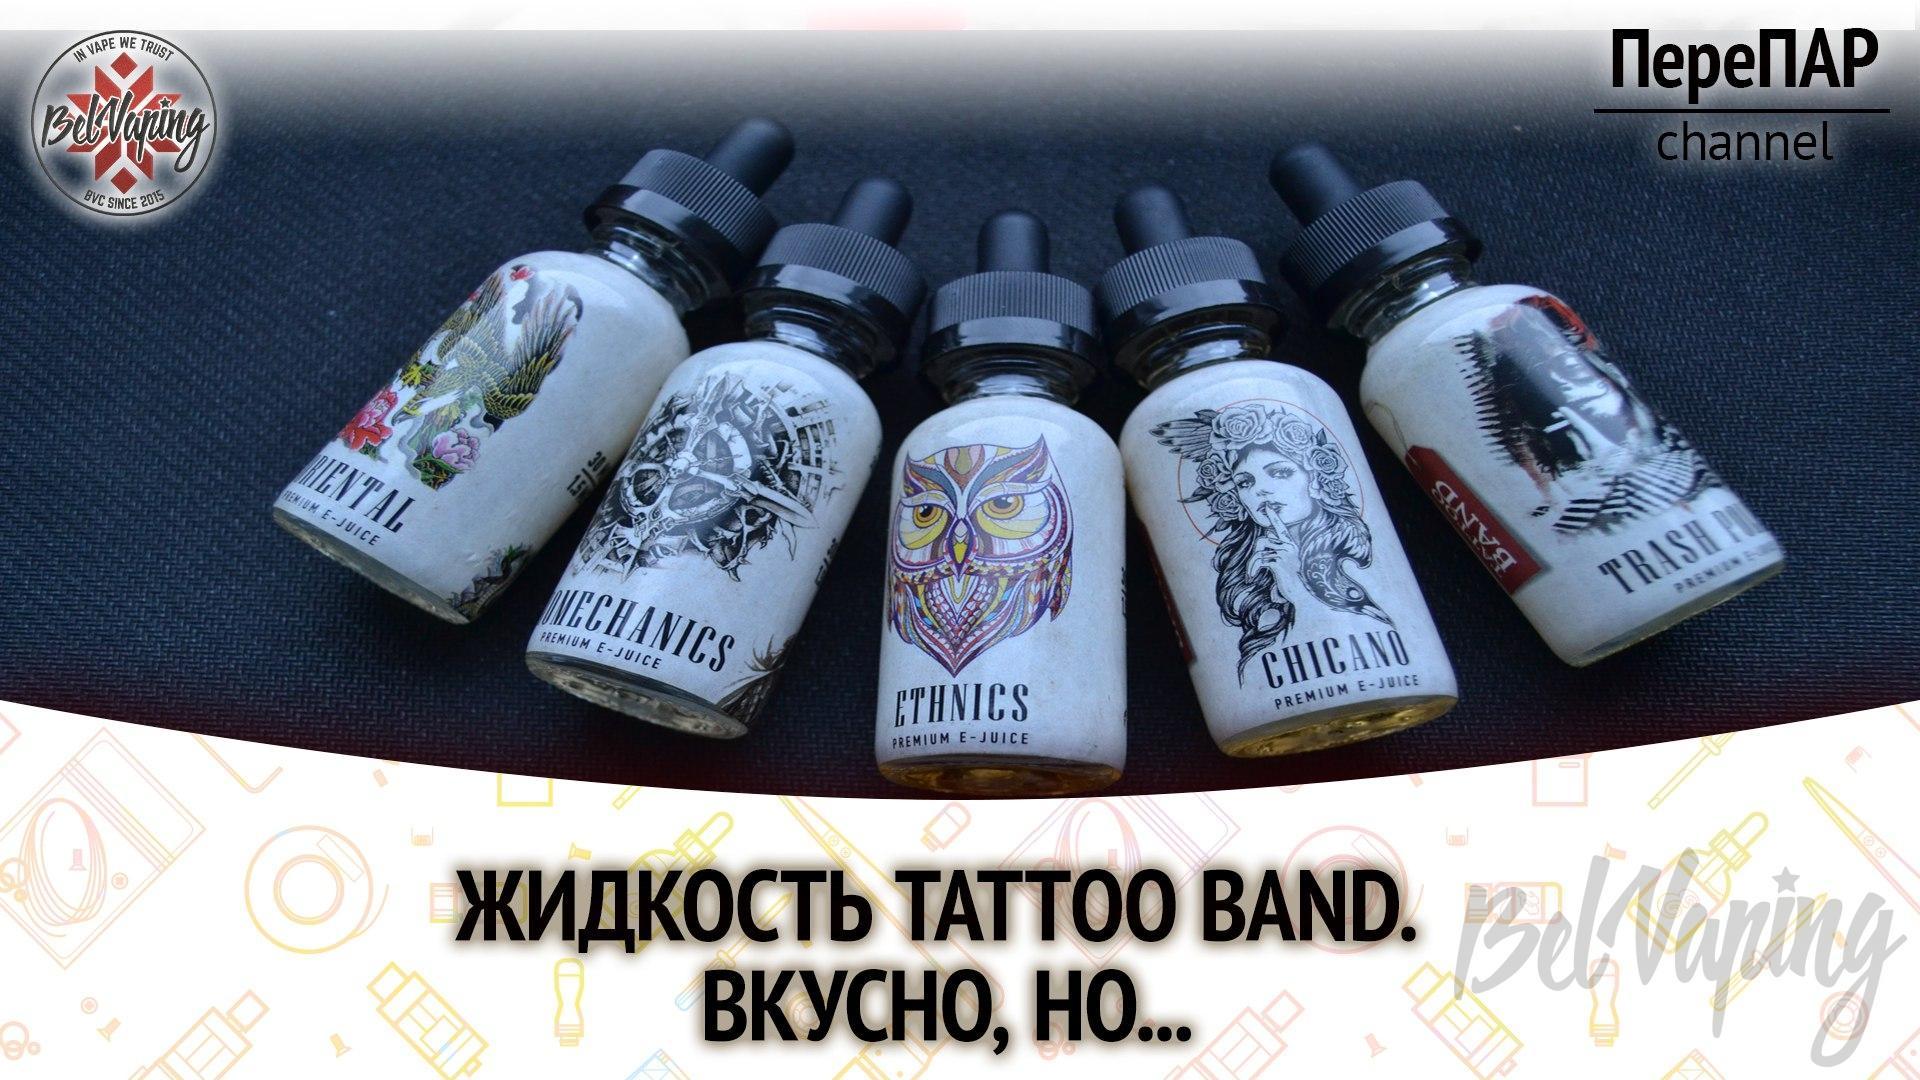 Обзор жидкости для вейпинга Tattoo Band